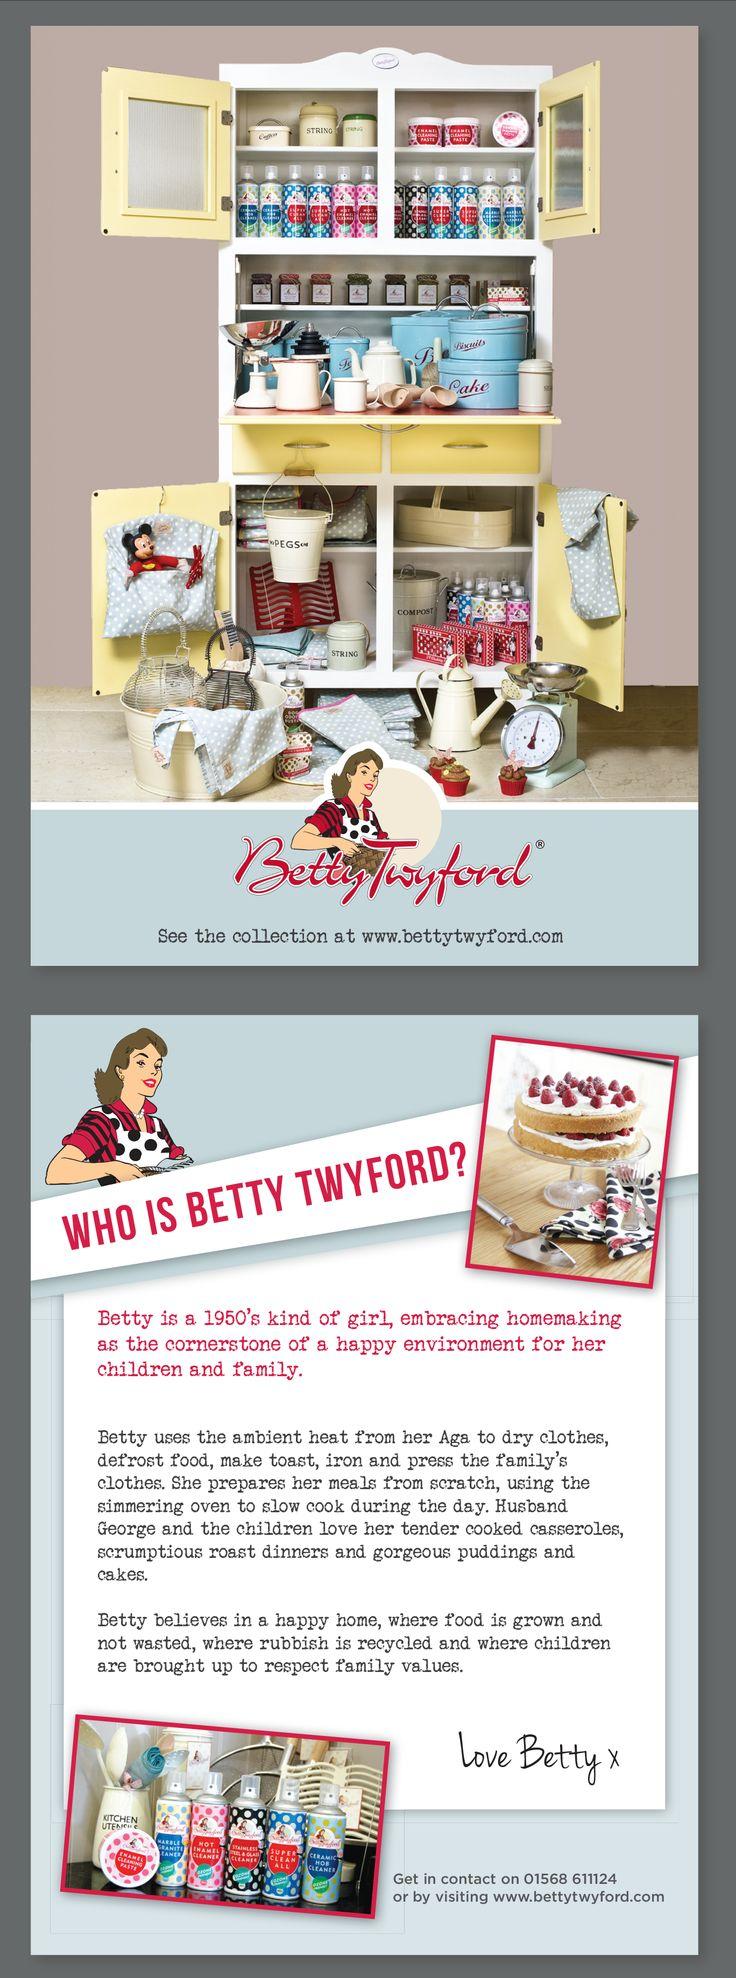 Betty Twyford #branded story #postcards by Orphans Press www.bettytwyford.com #Print